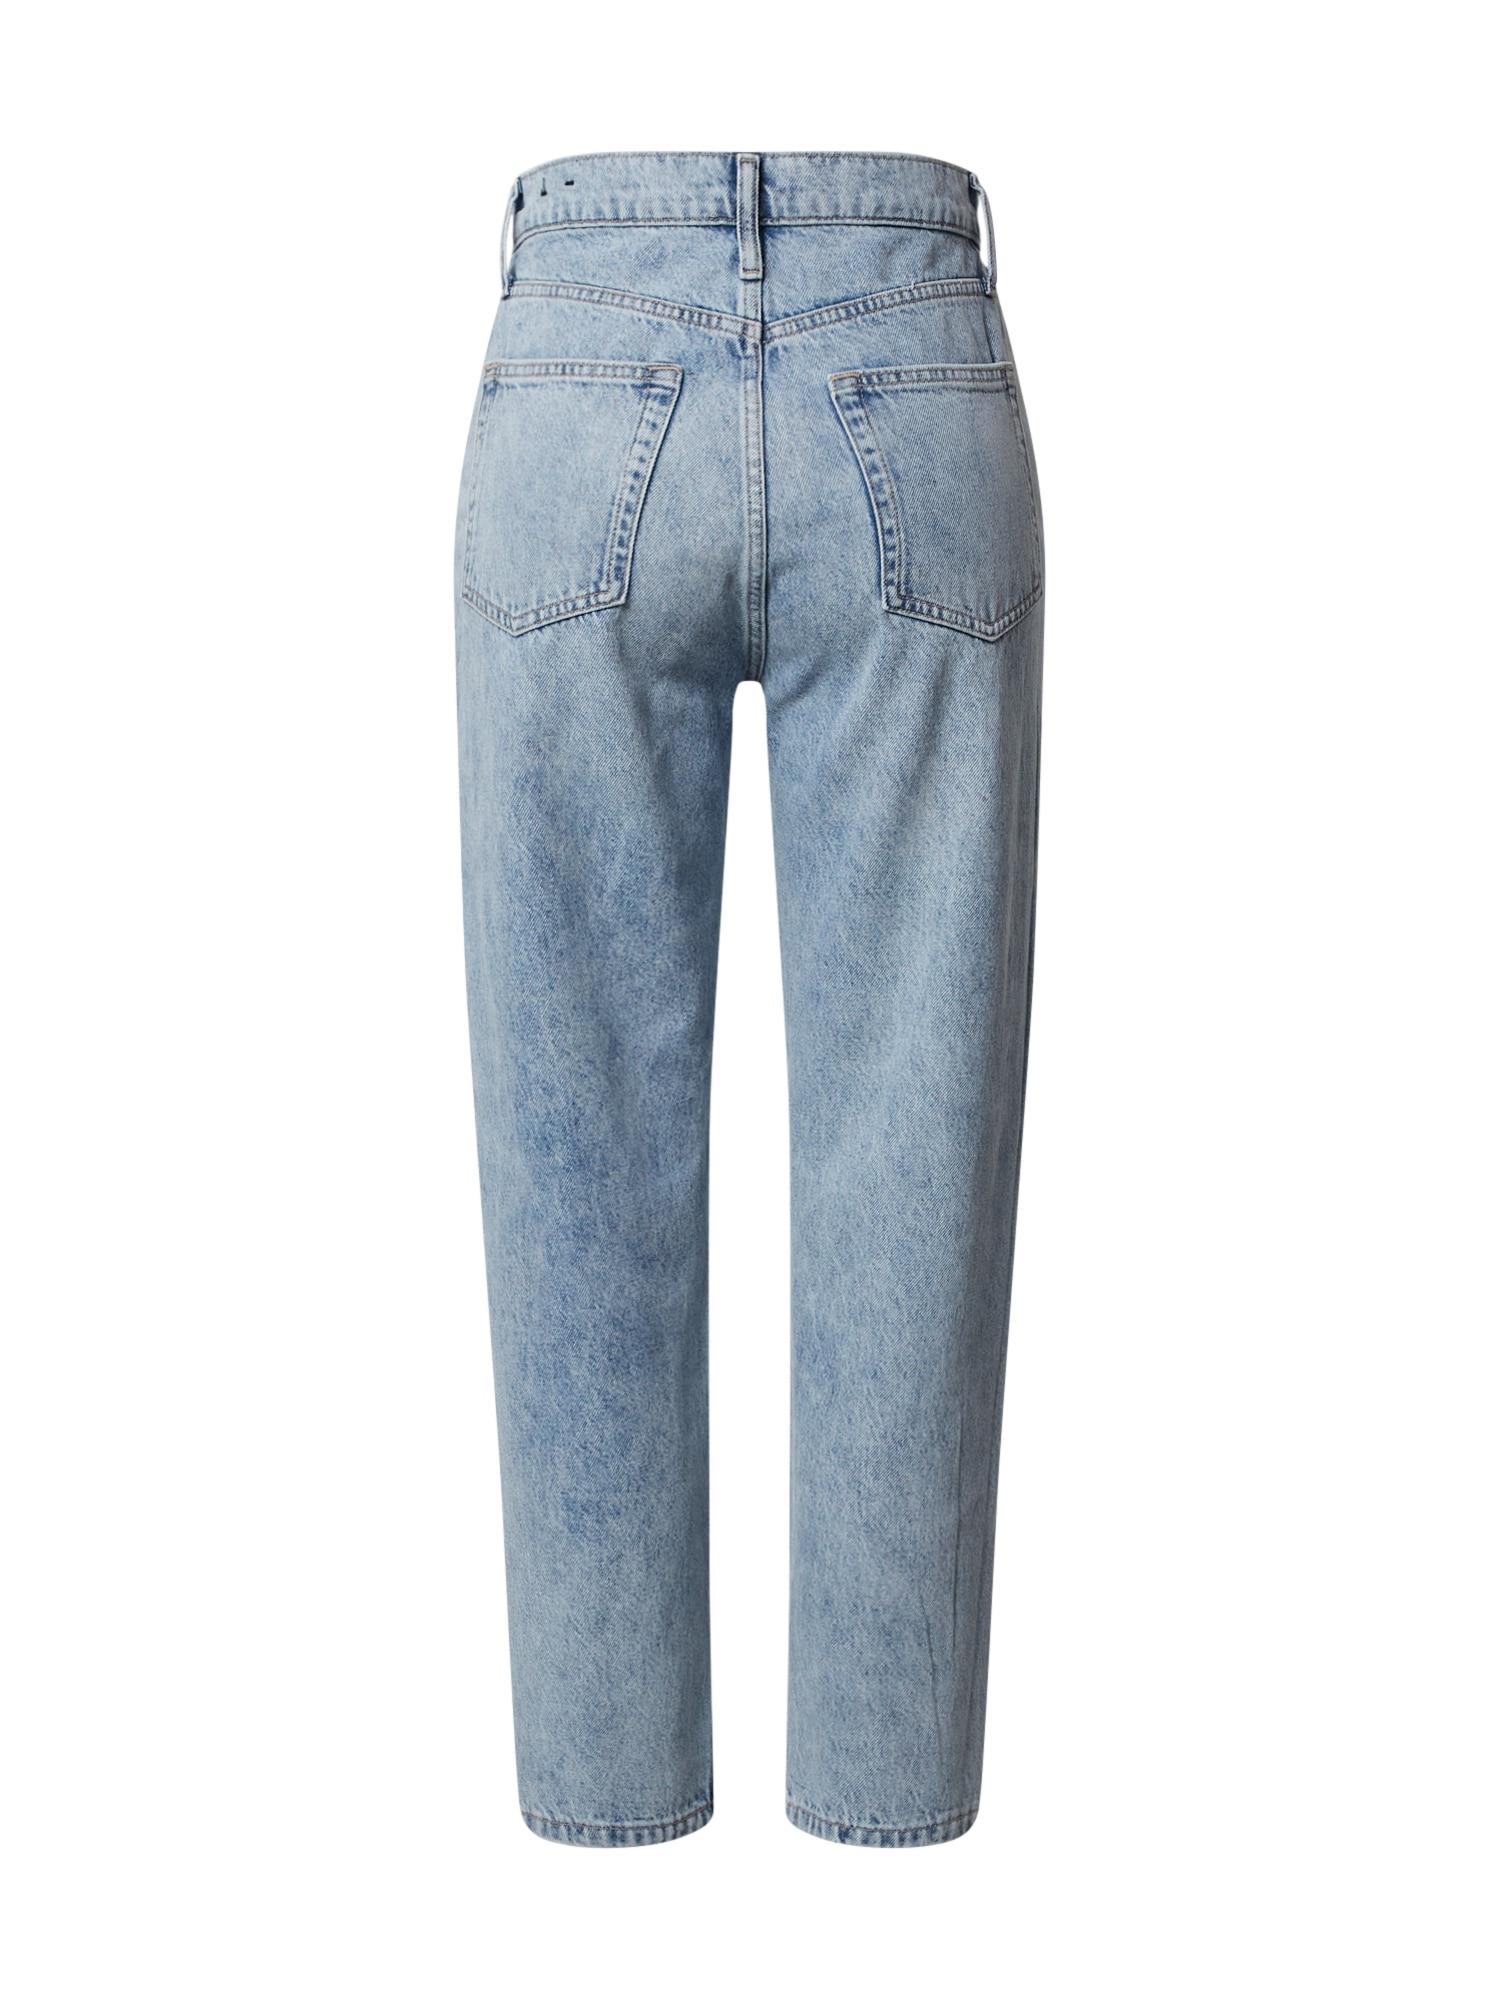 gap - Jeans 'V-MOM JEAN BLEACH THOMAS'